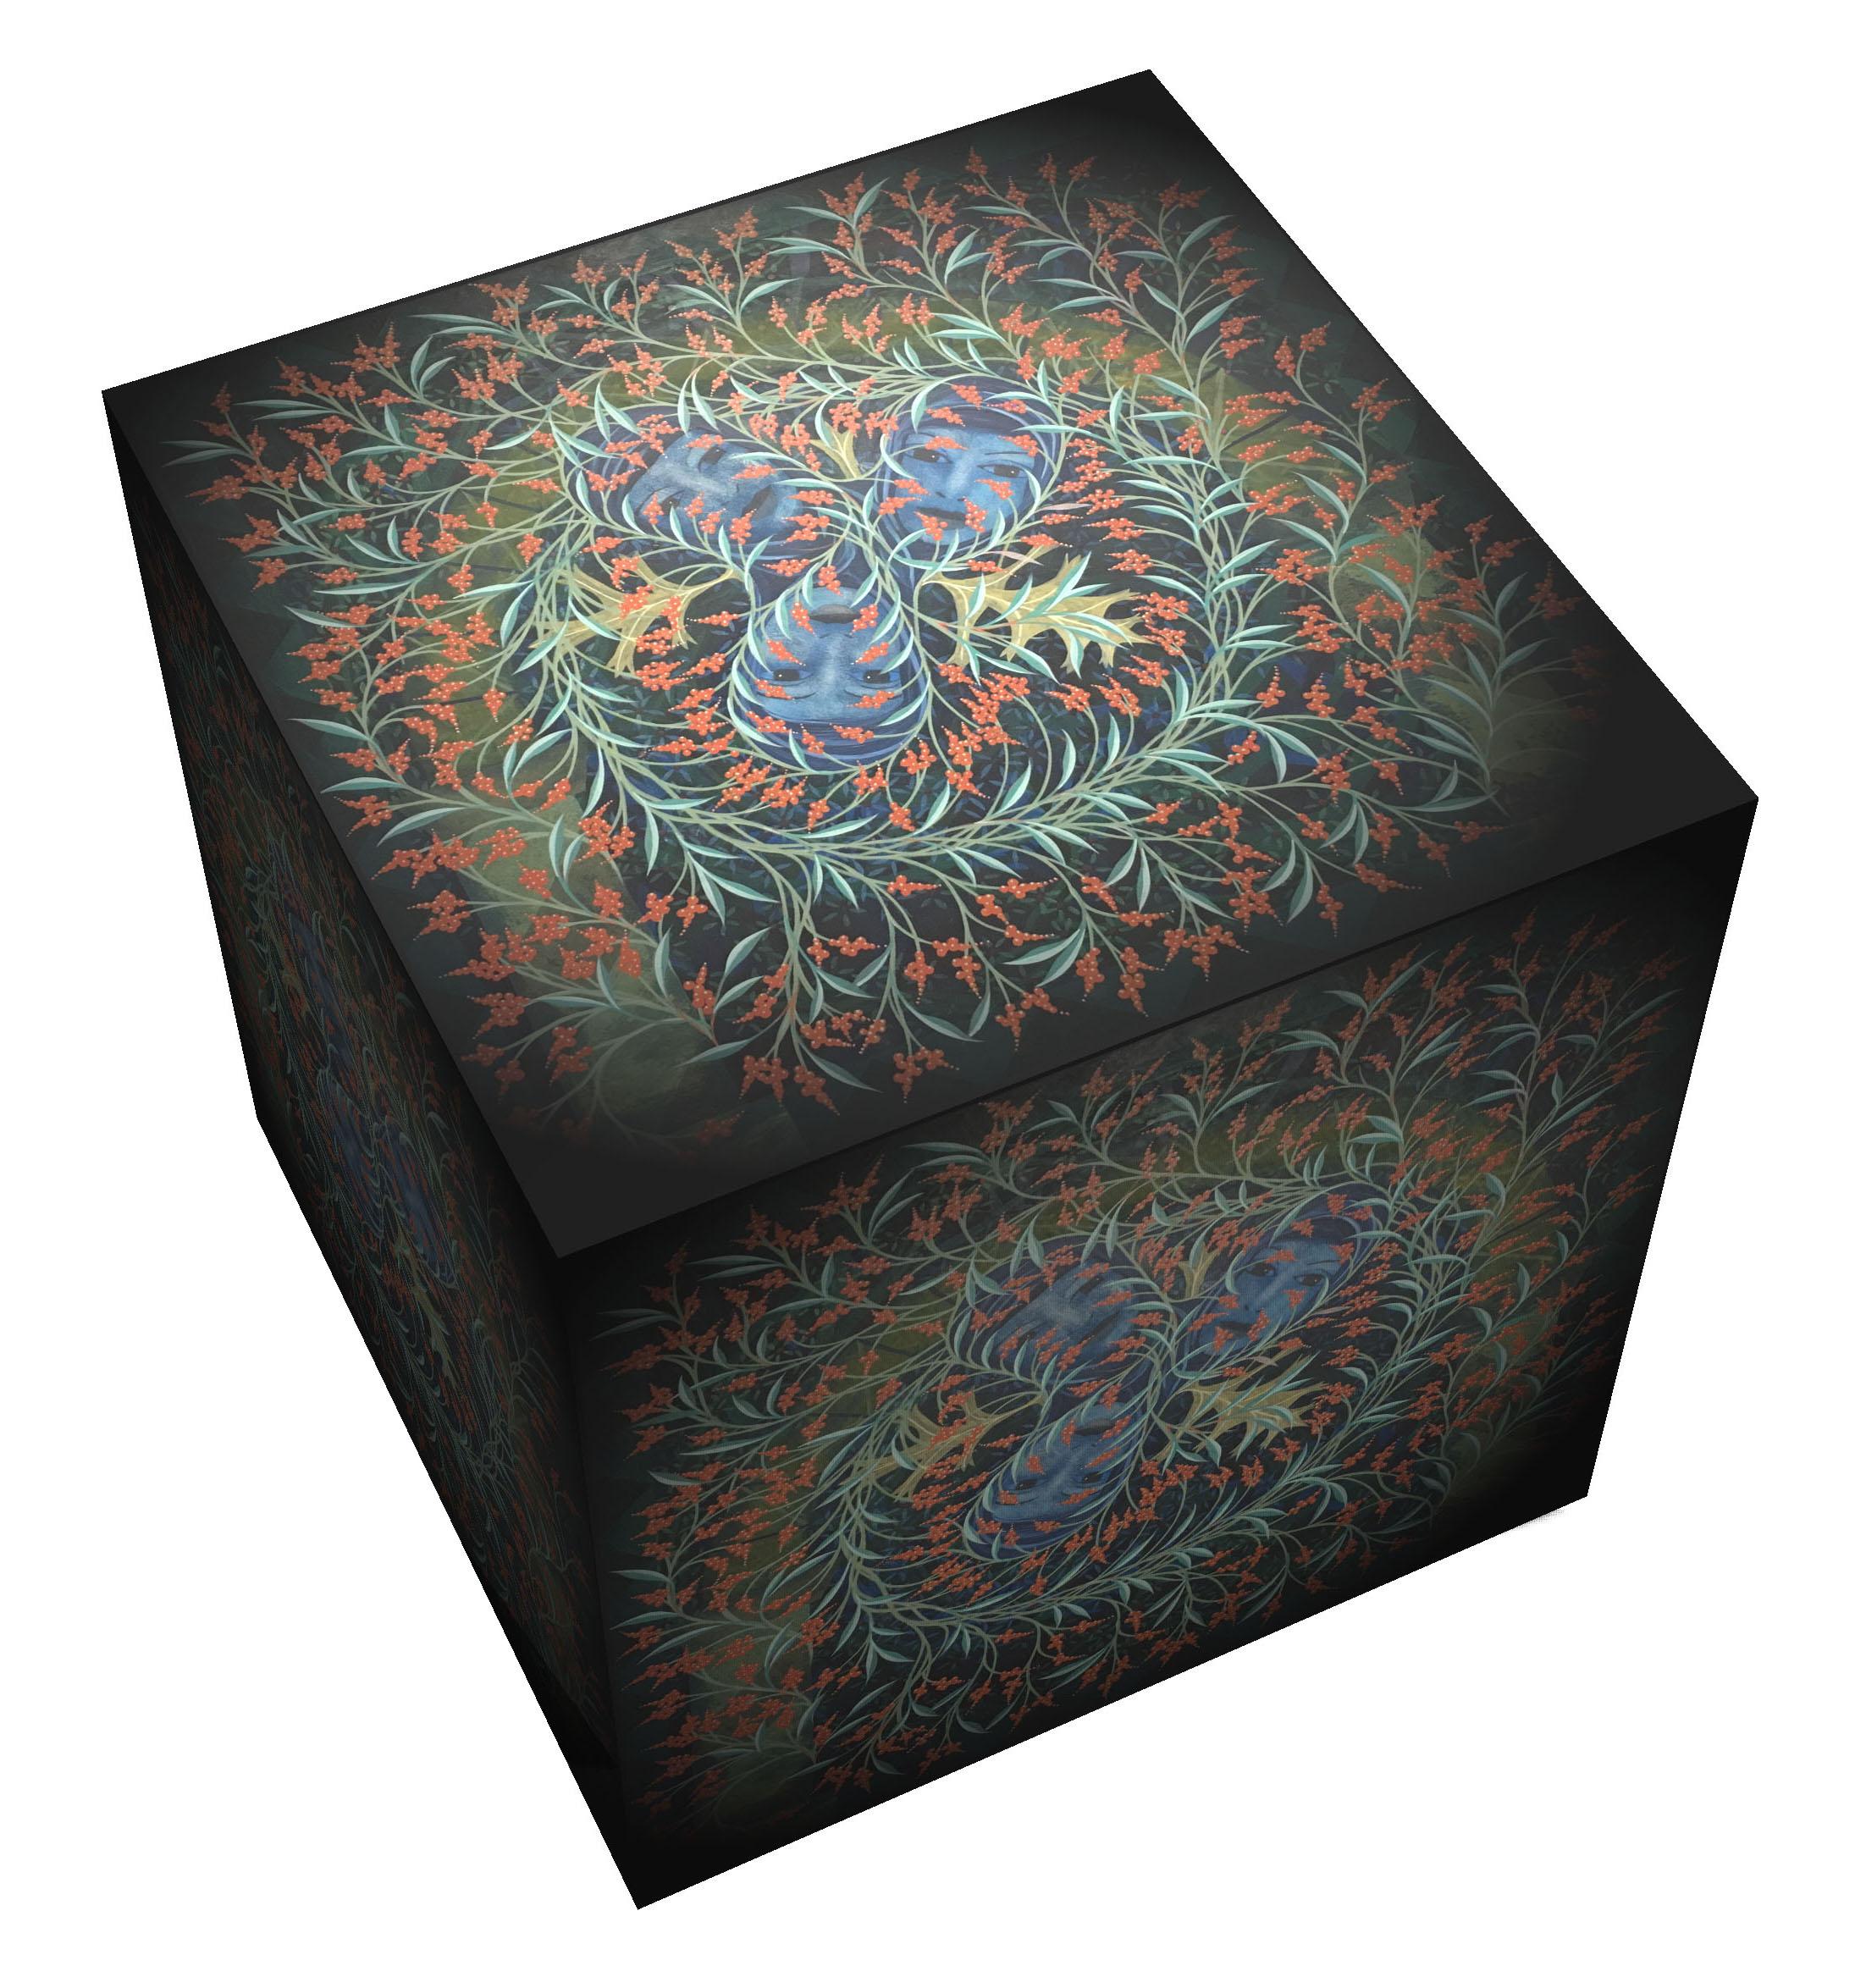 Tripartite.Cube.1